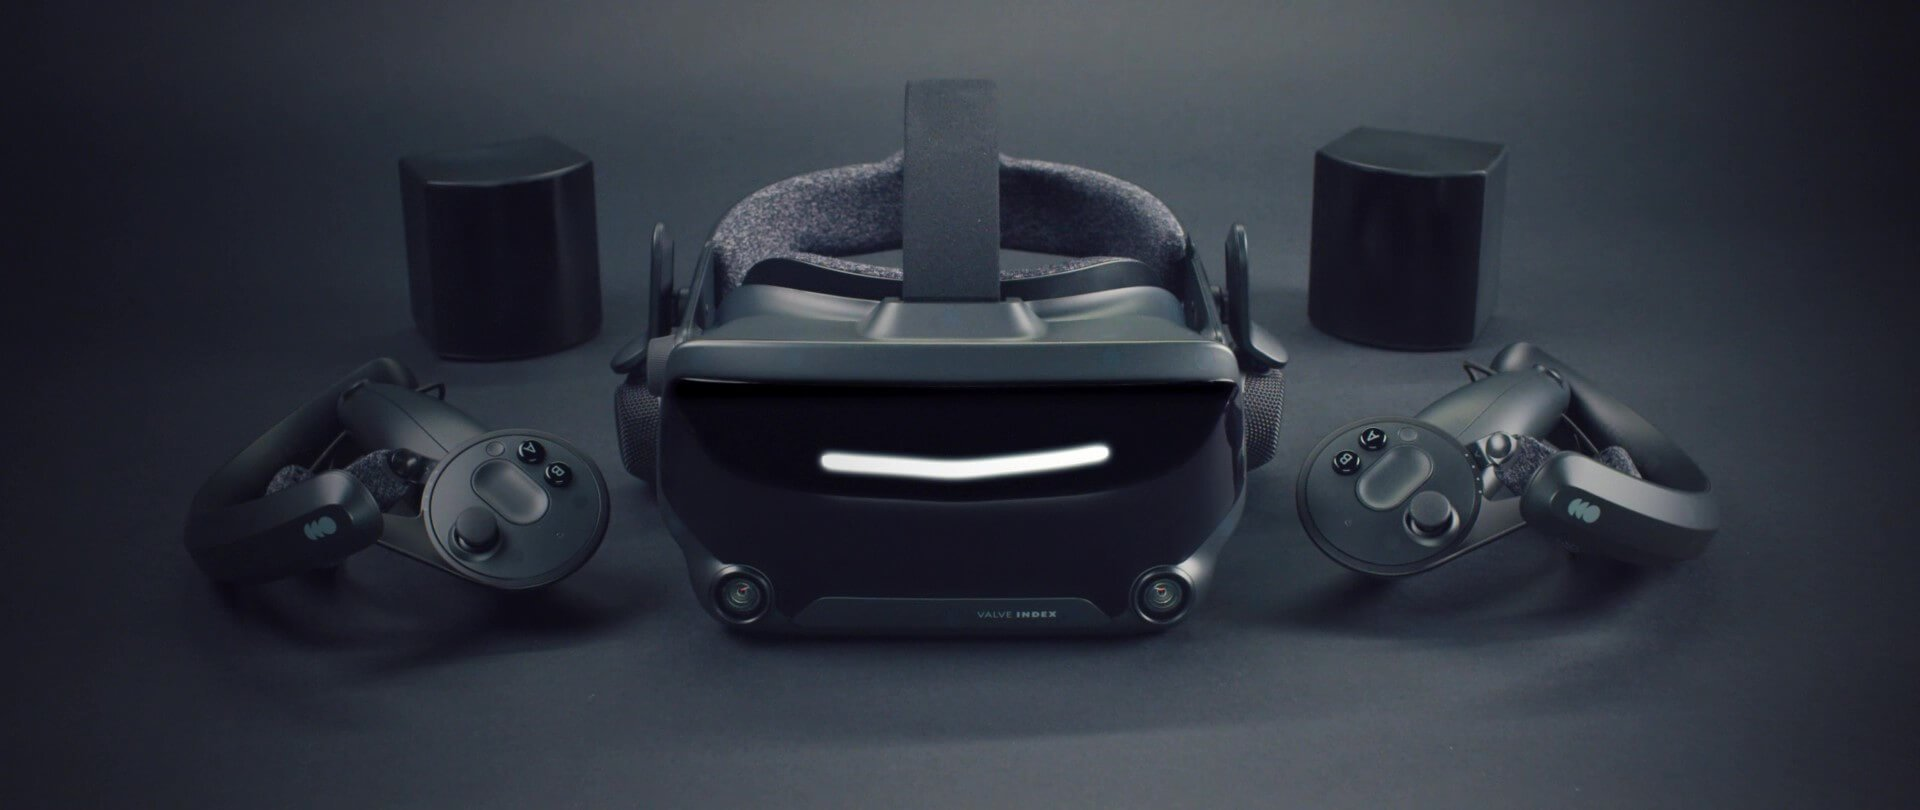 V社《半条命Alyx》访谈:VR一直缺少这么一款扛鼎之作